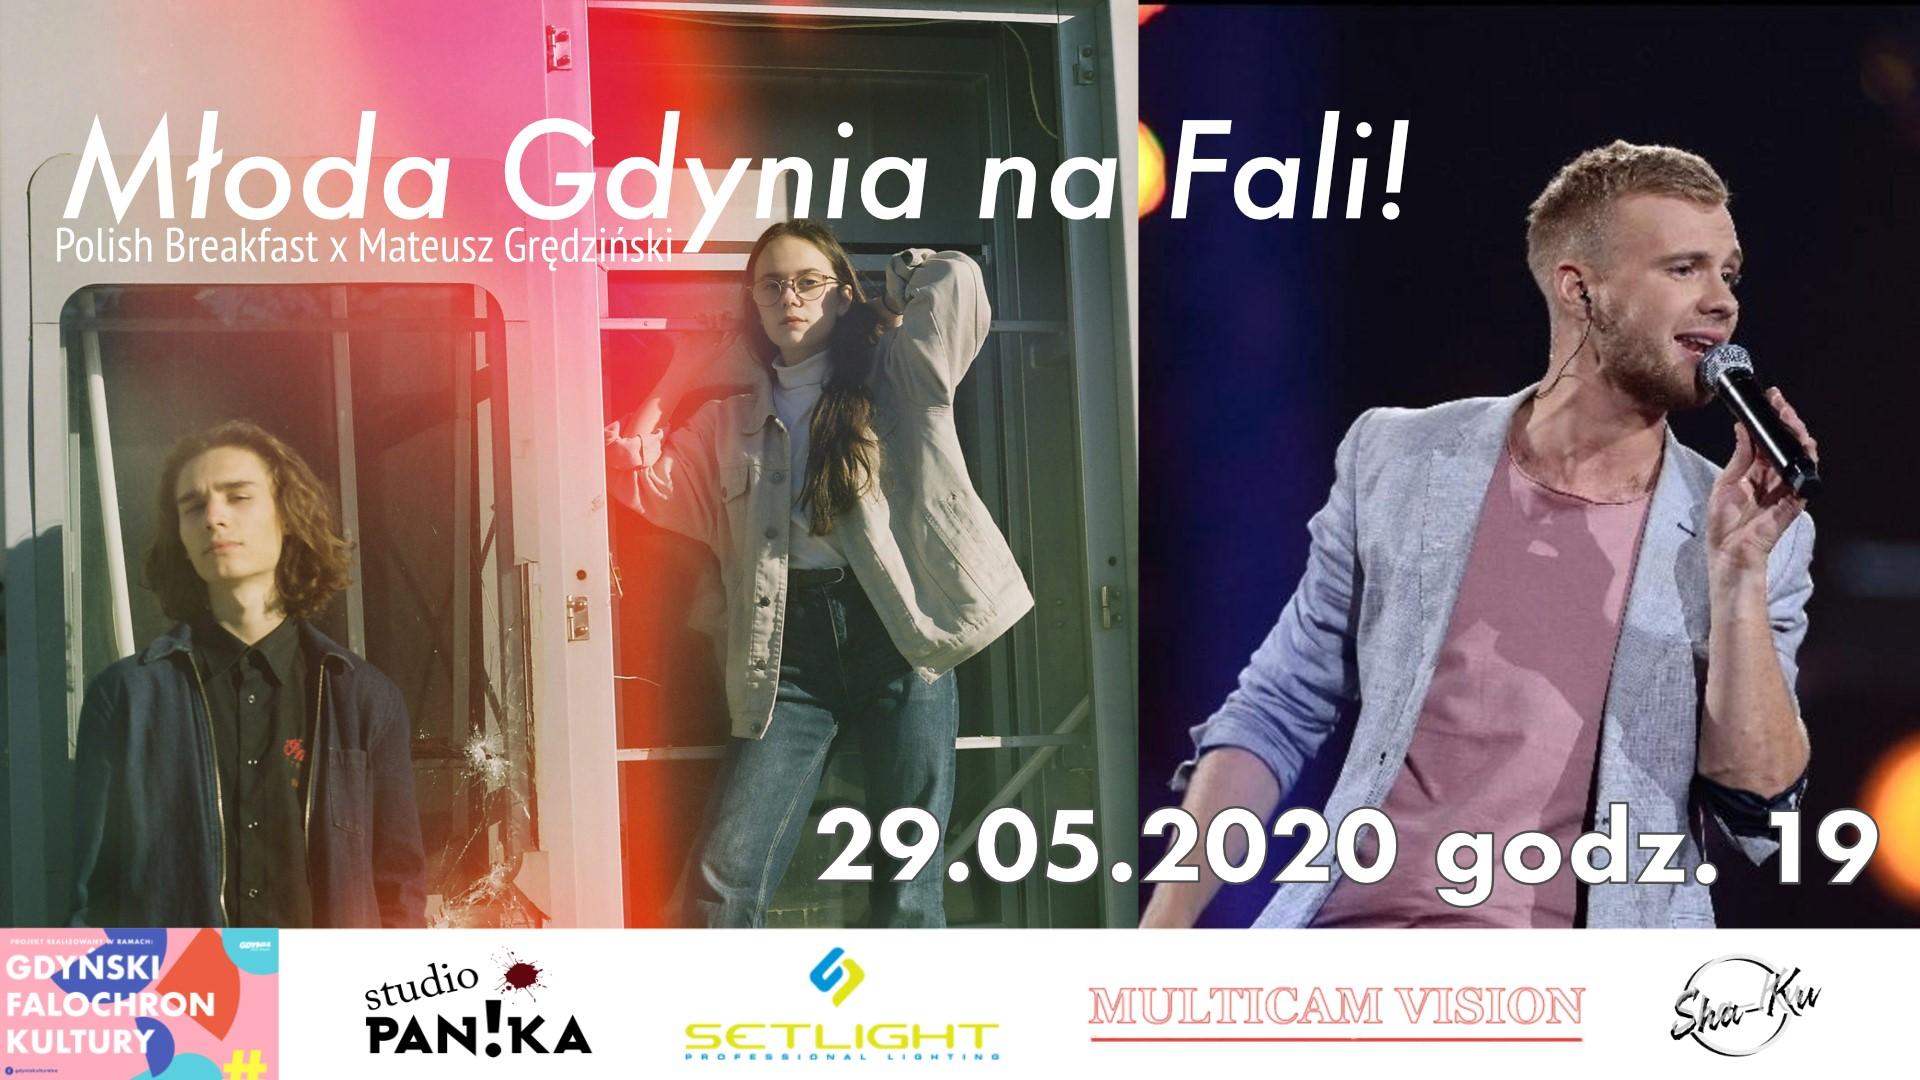 Młoda Gdynia na Fali!